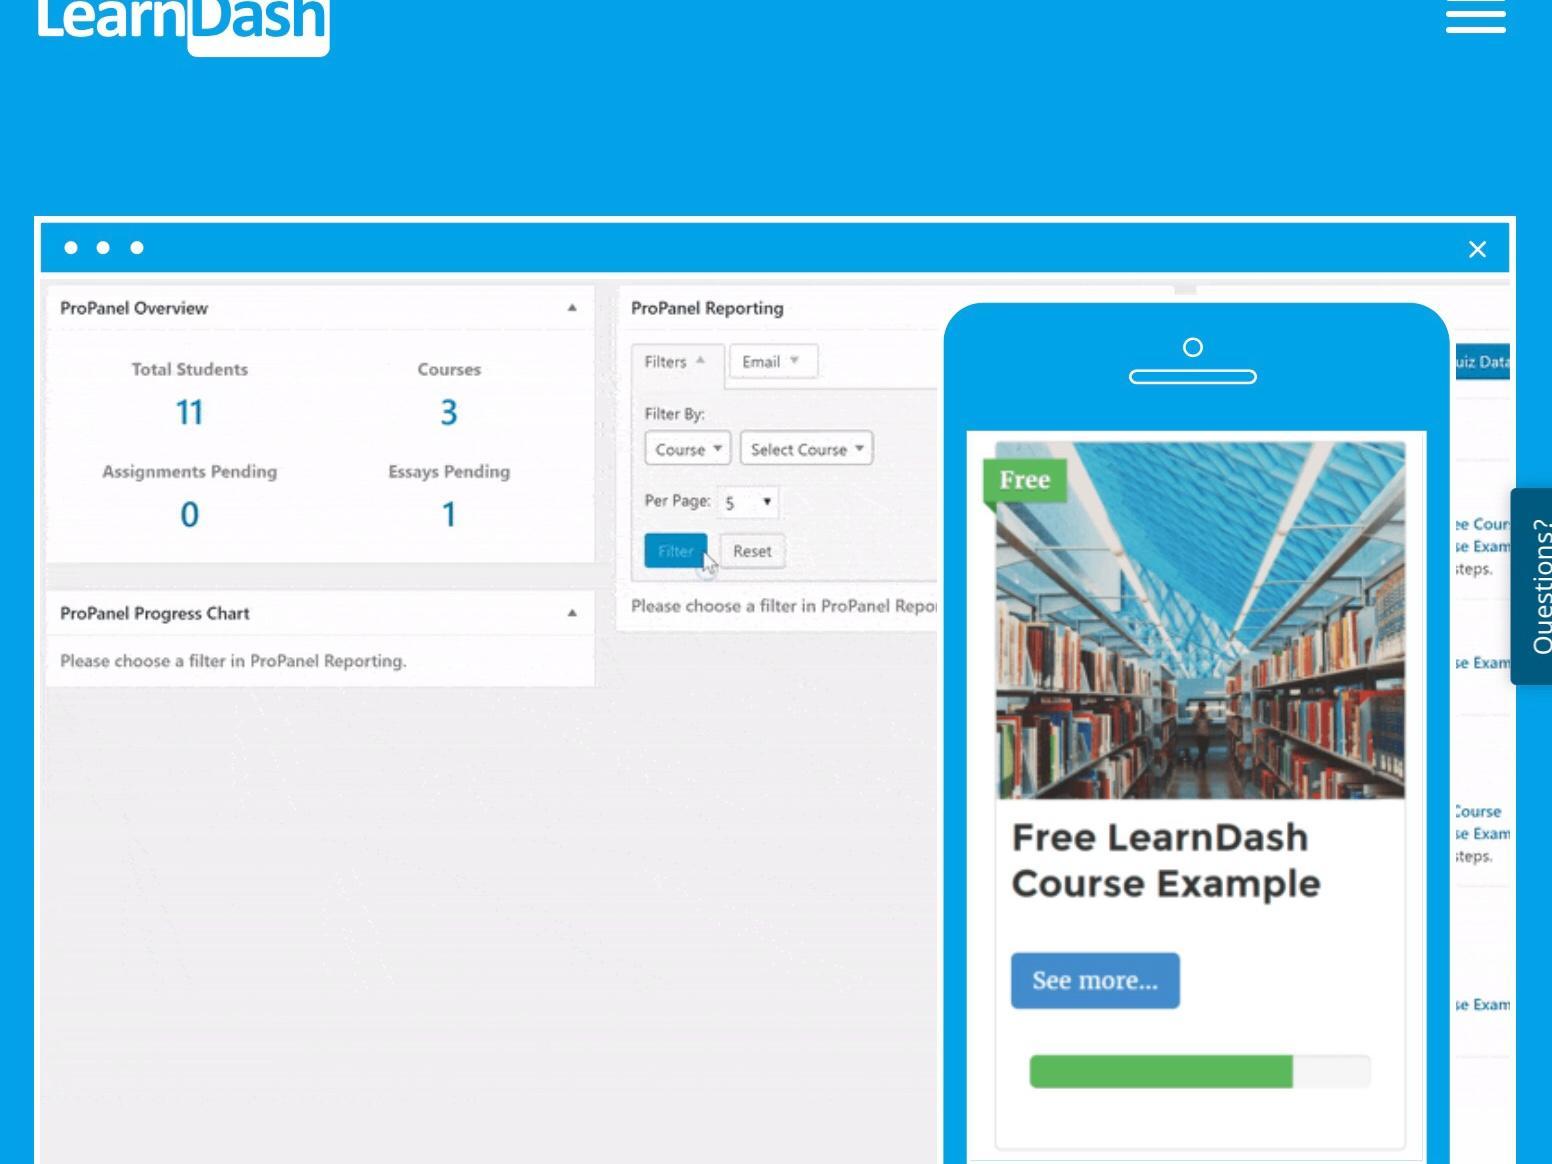 learndash-credit-learndash.jpg